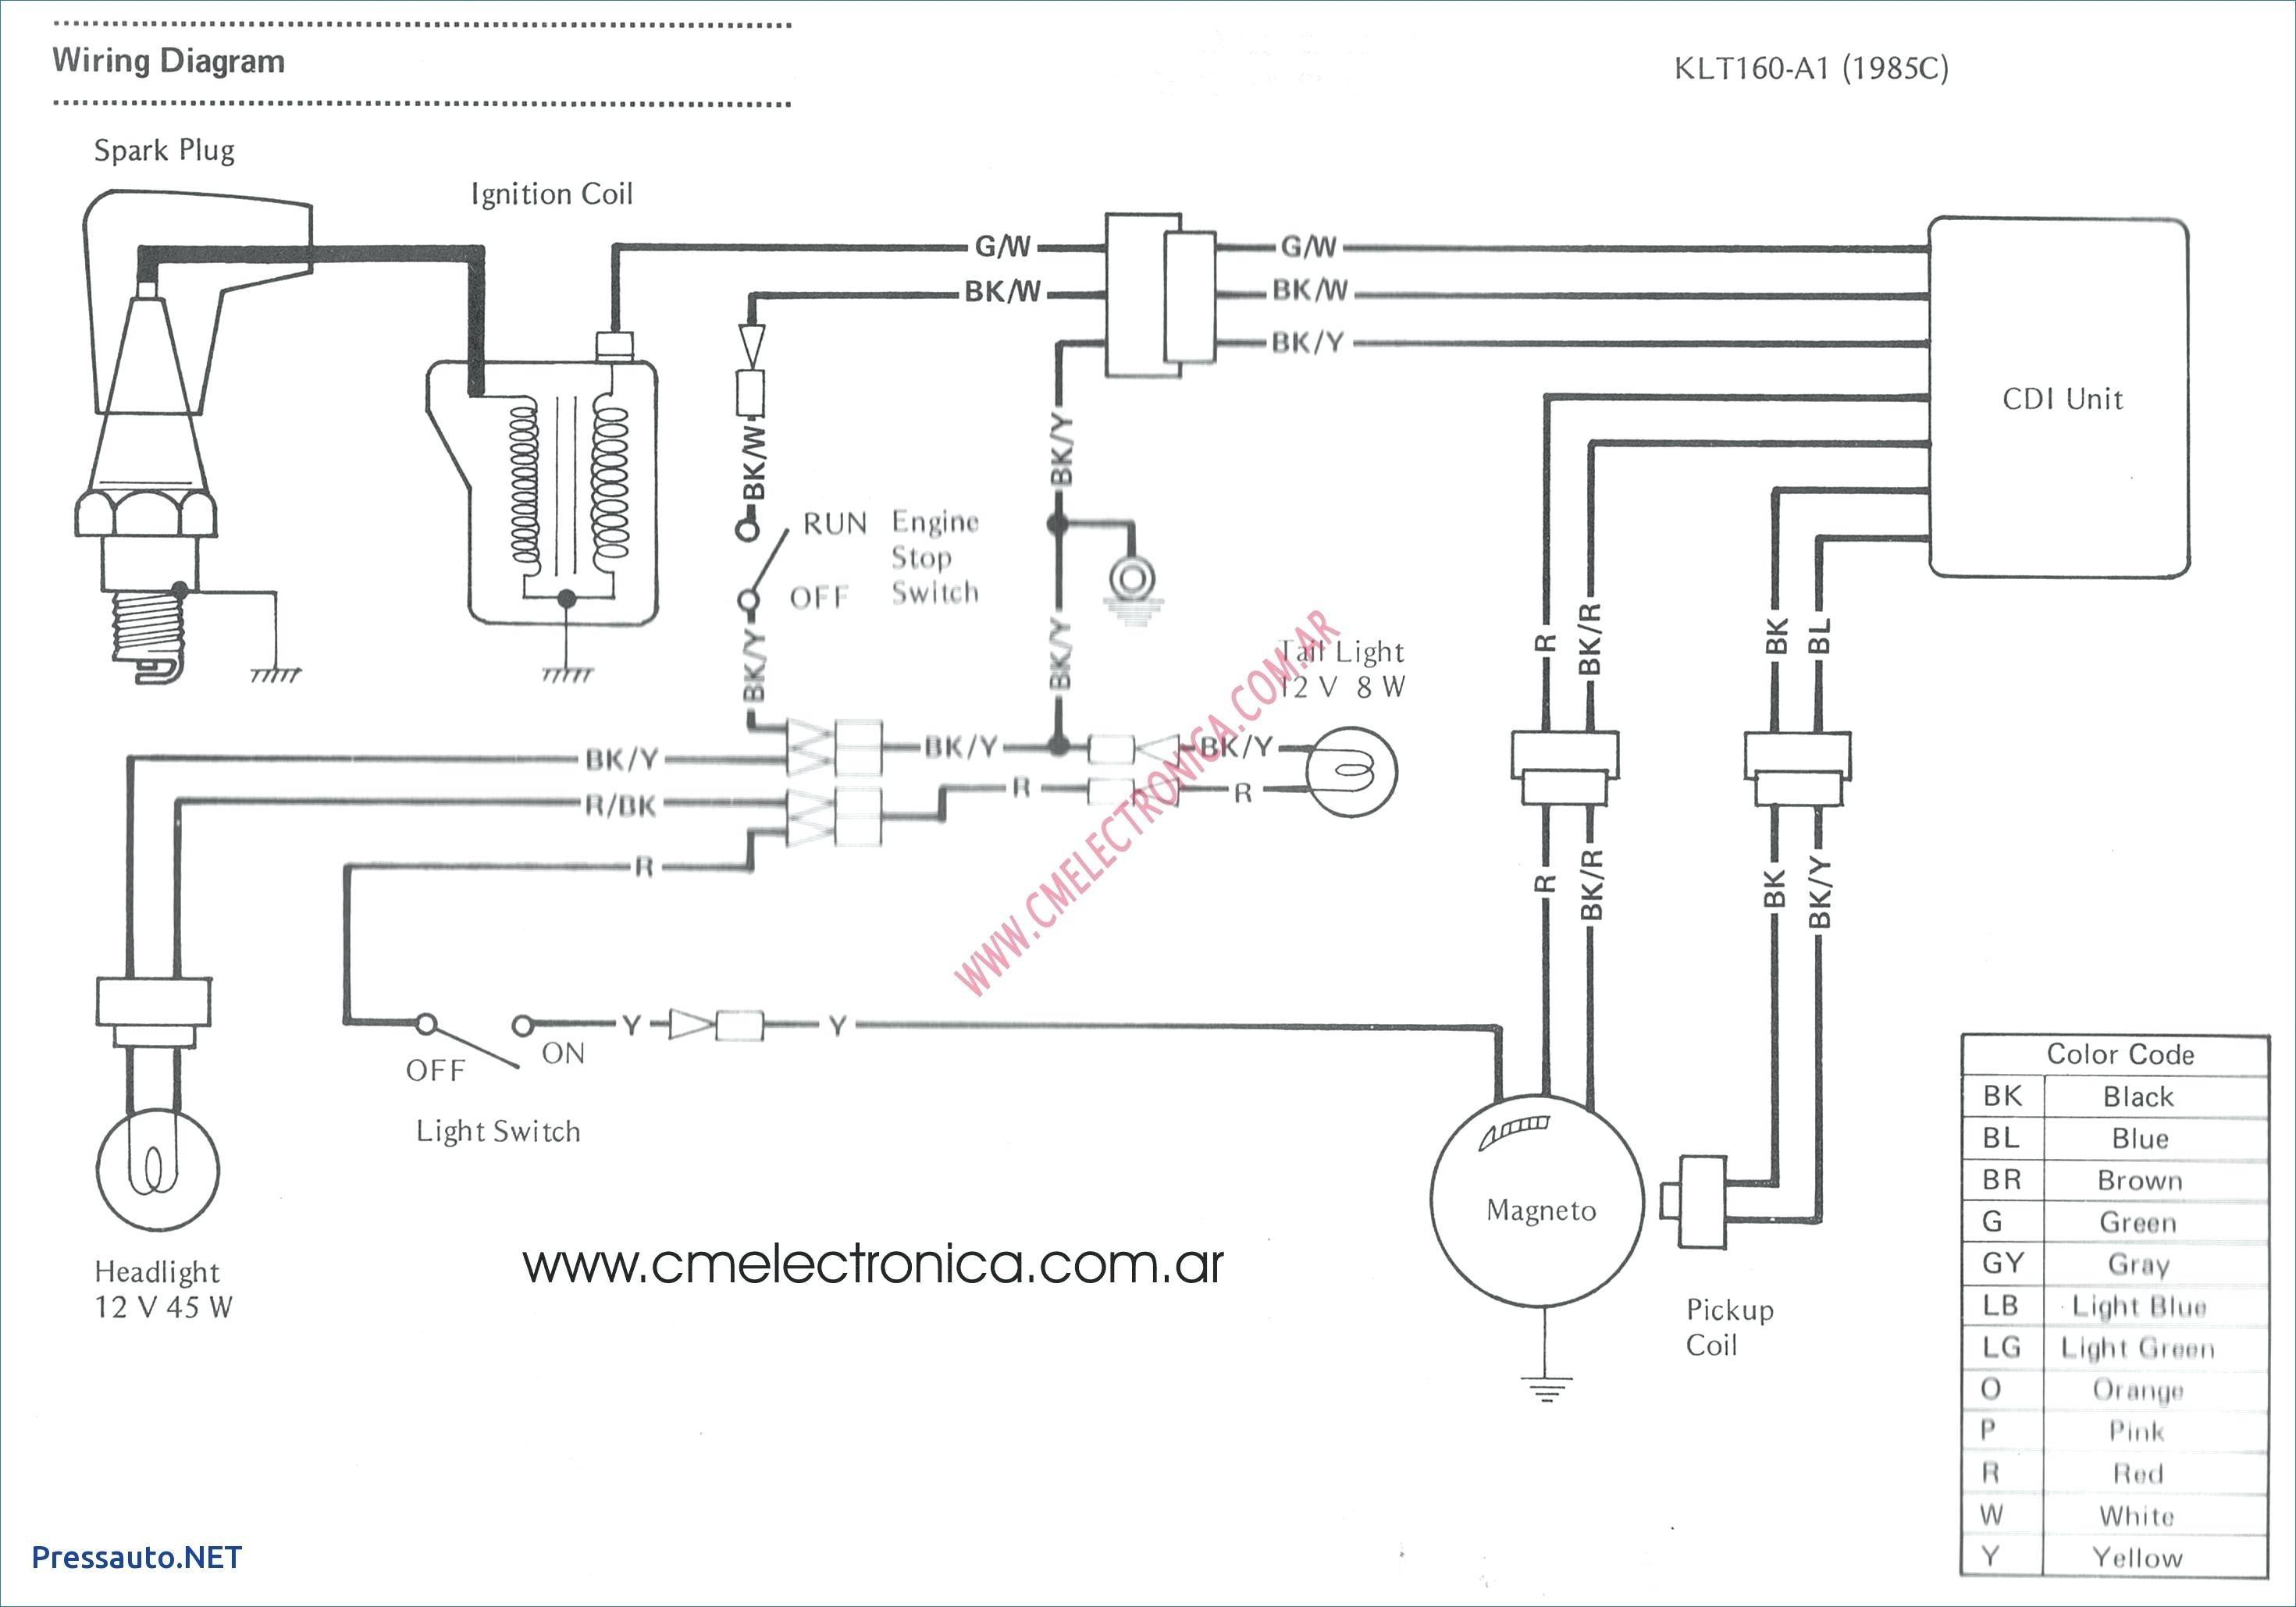 hds 8 wiring diagram xz 5775  karcher pressure washer wiring diagrams free diagram  karcher pressure washer wiring diagrams